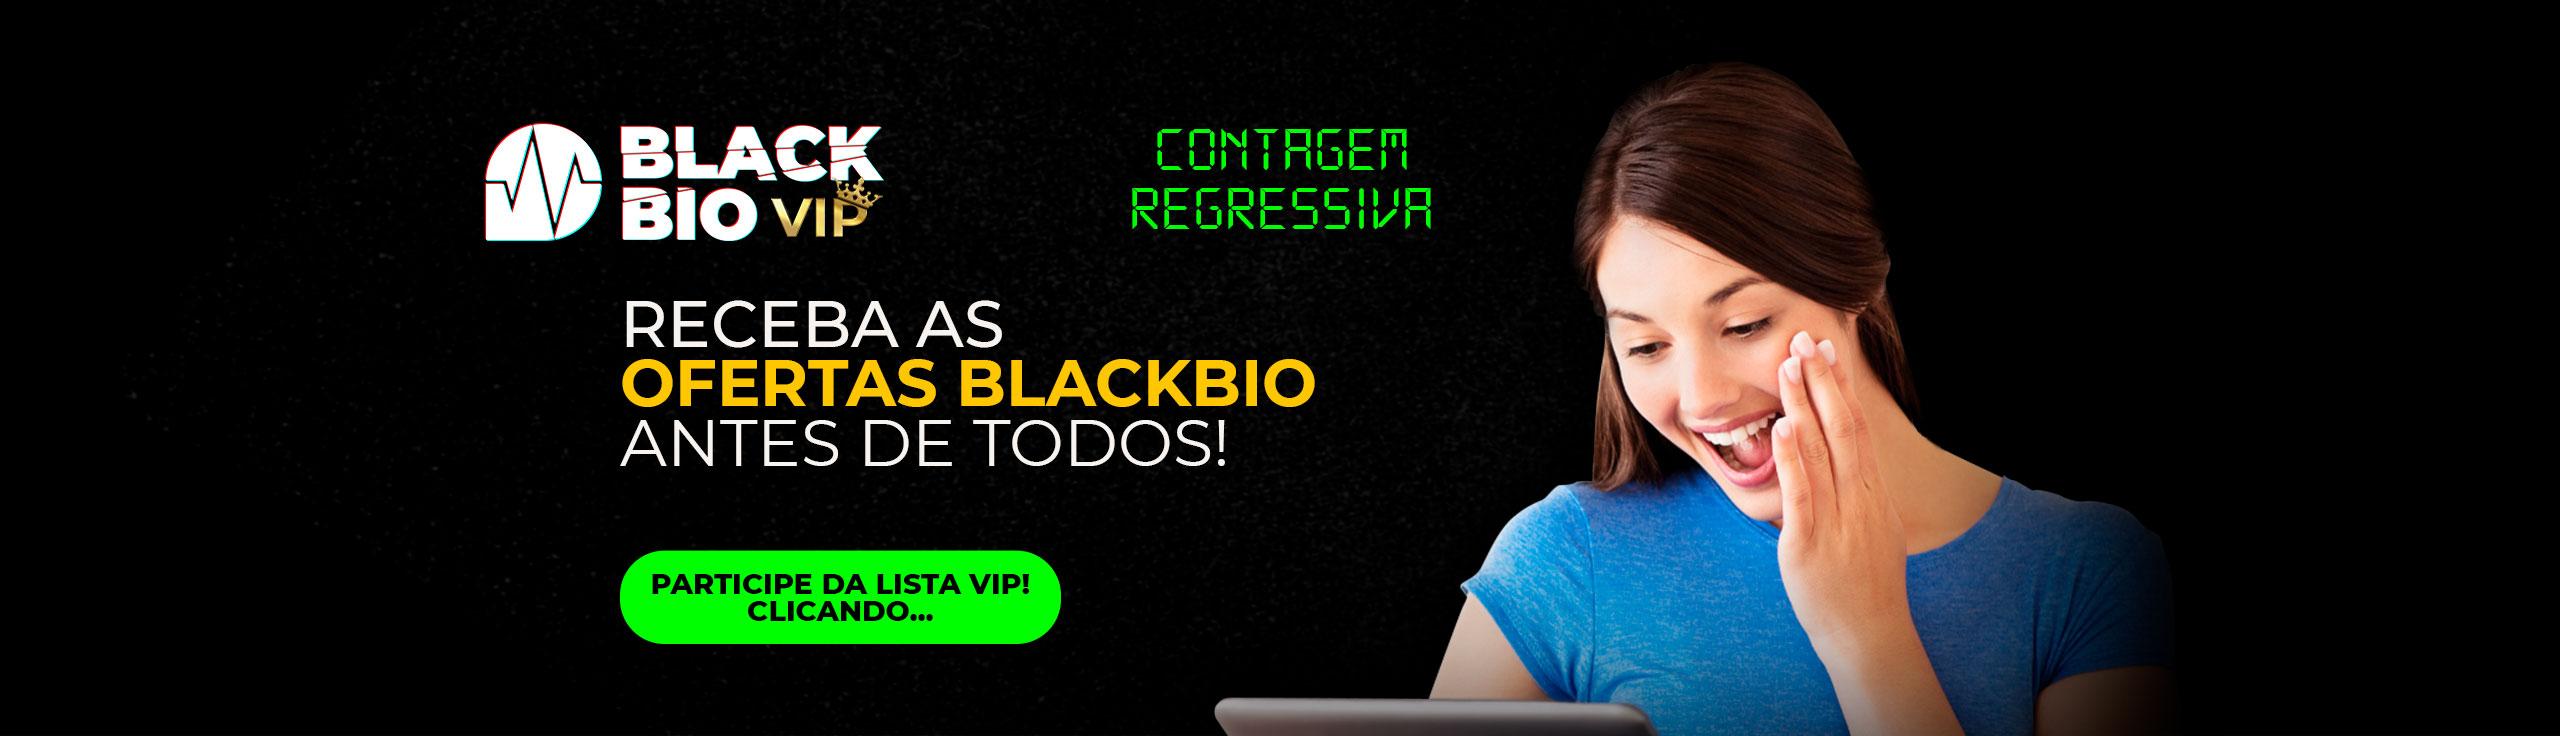 BlackBio VIP